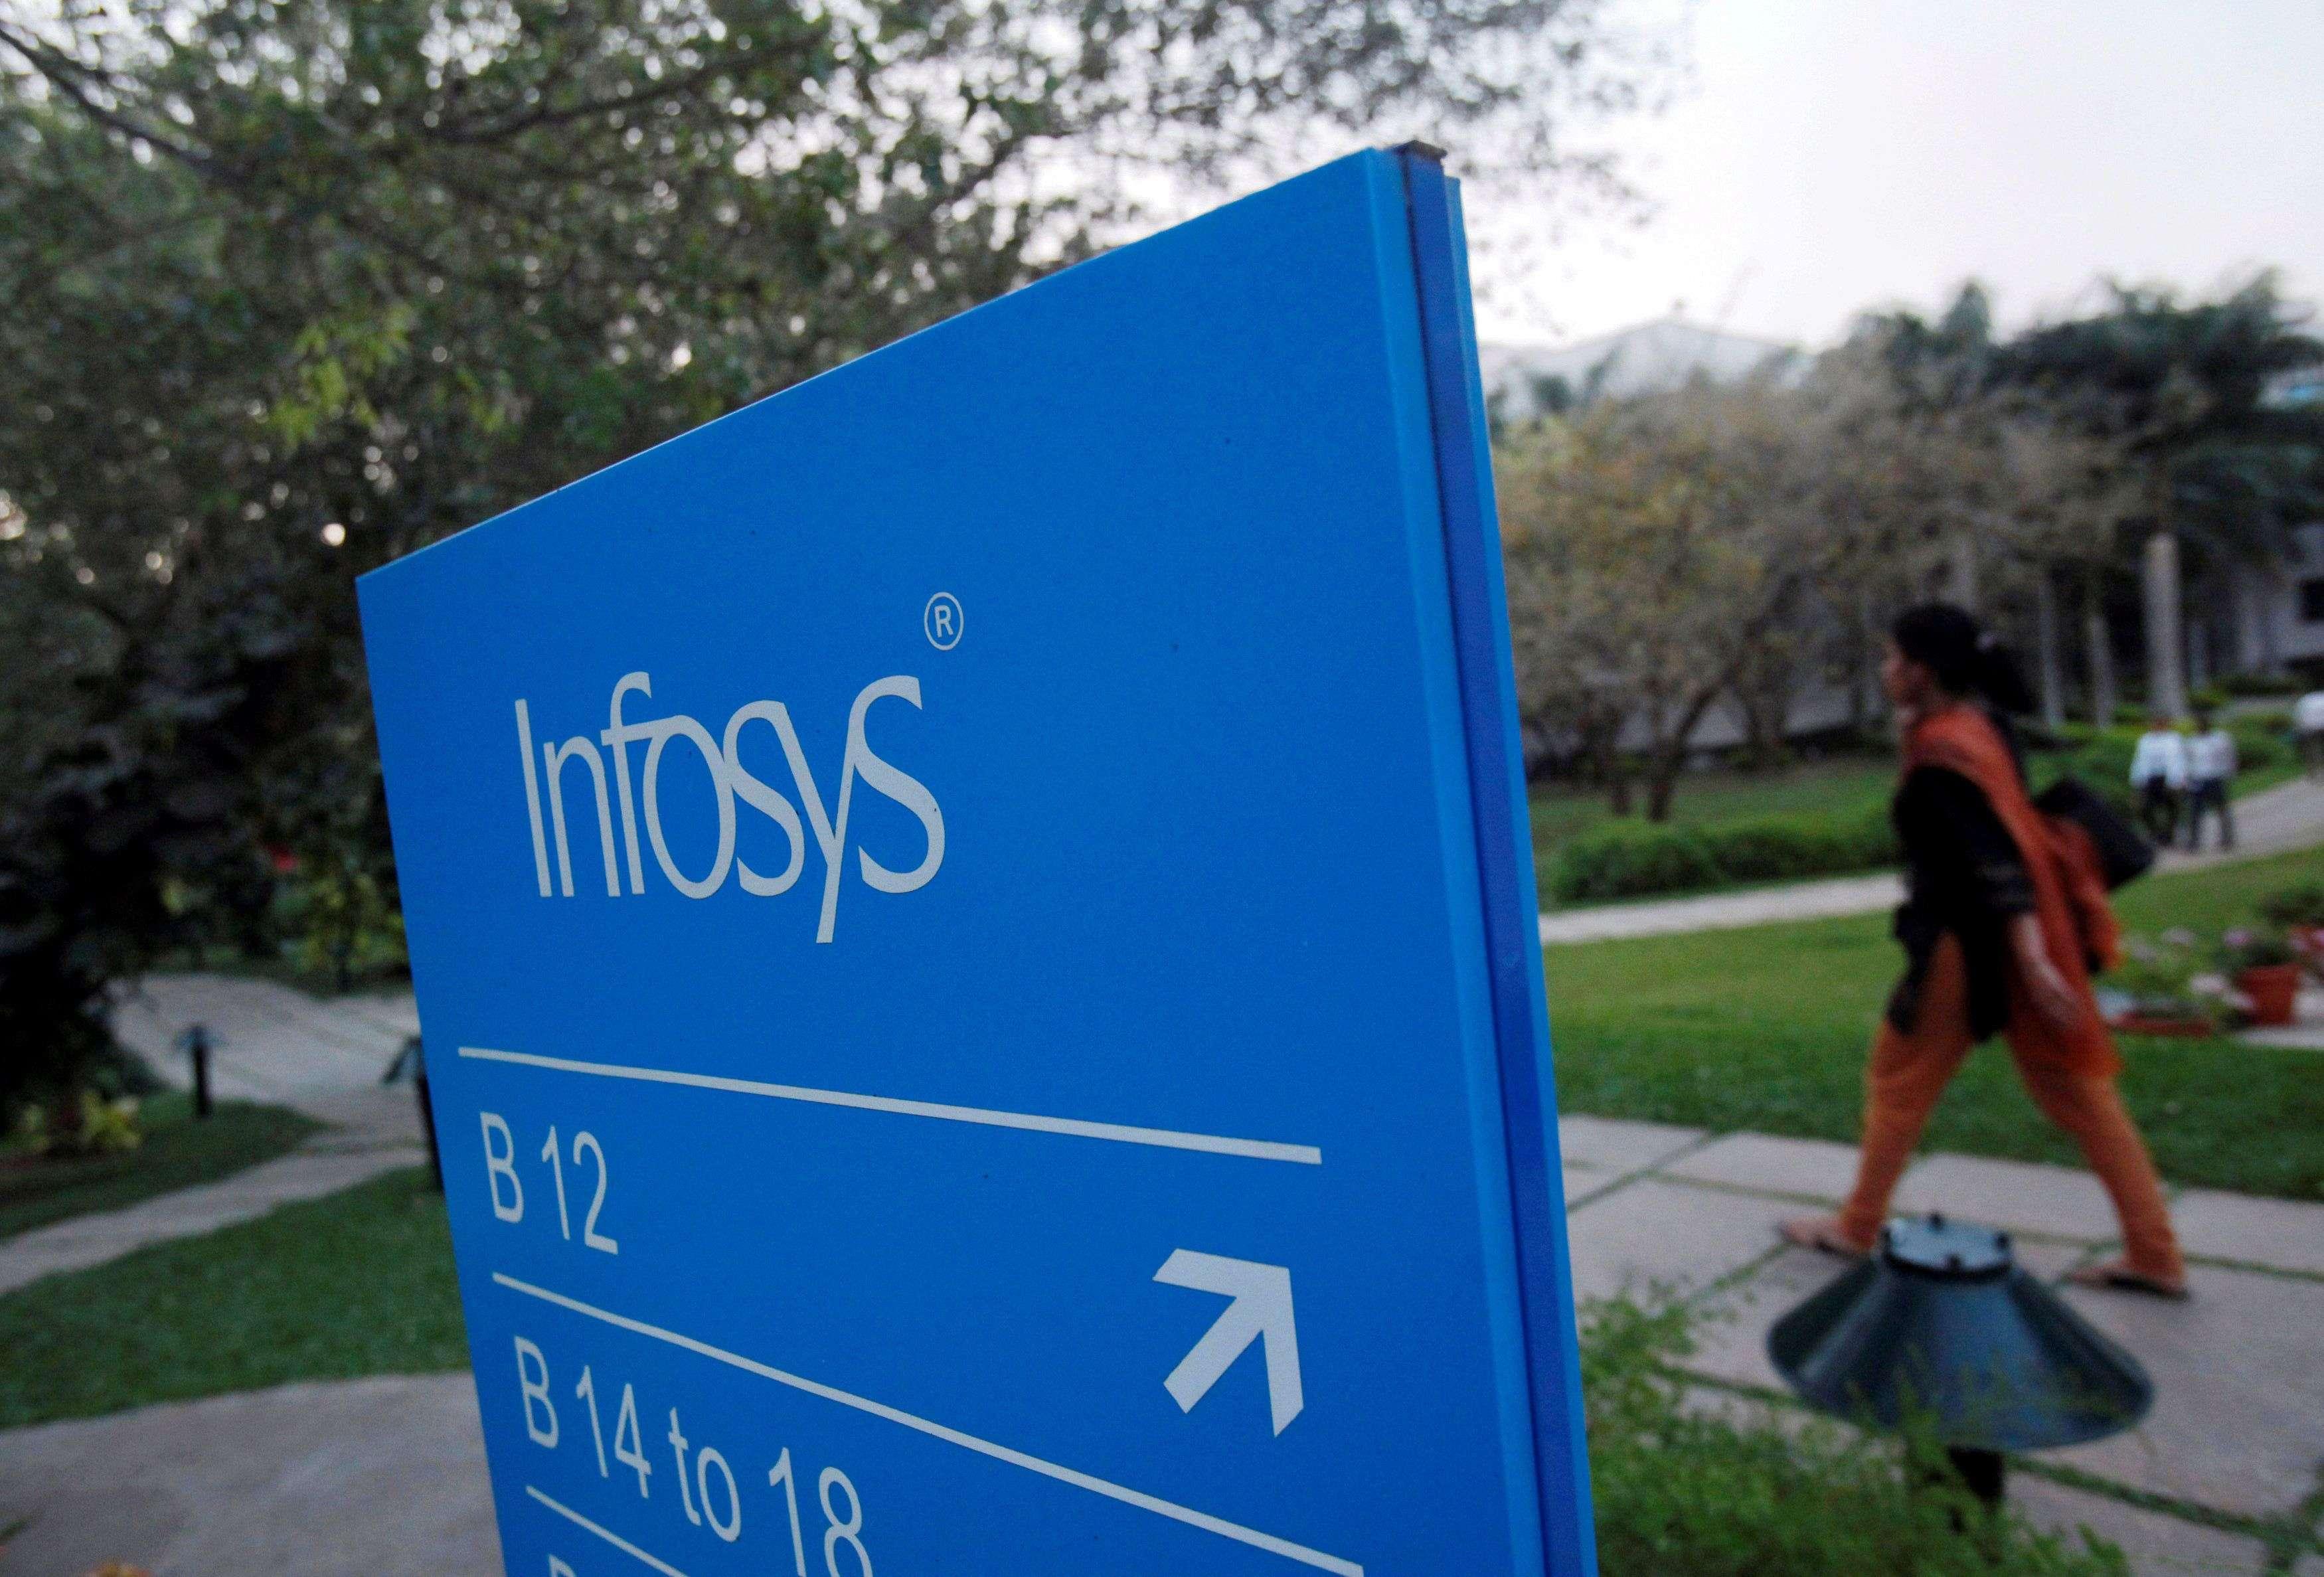 10 takeaways from Infosys' Q1 earnings: Panaya pain and a surprise bonus